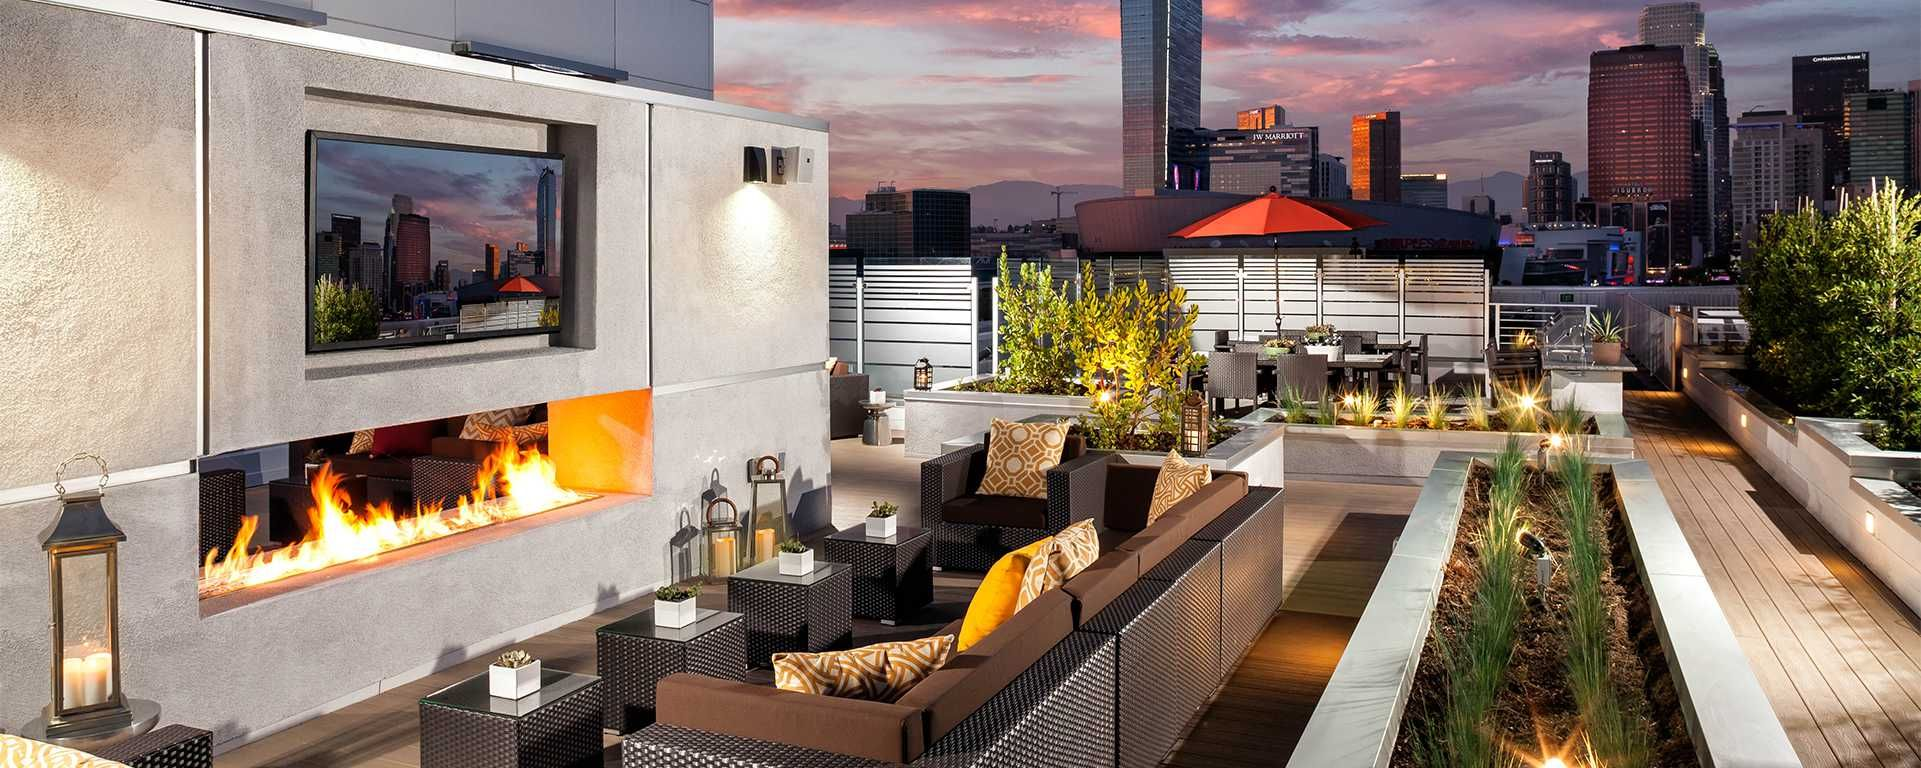 avant apartments dtla living in downtown la pinterest los angeles area. Black Bedroom Furniture Sets. Home Design Ideas